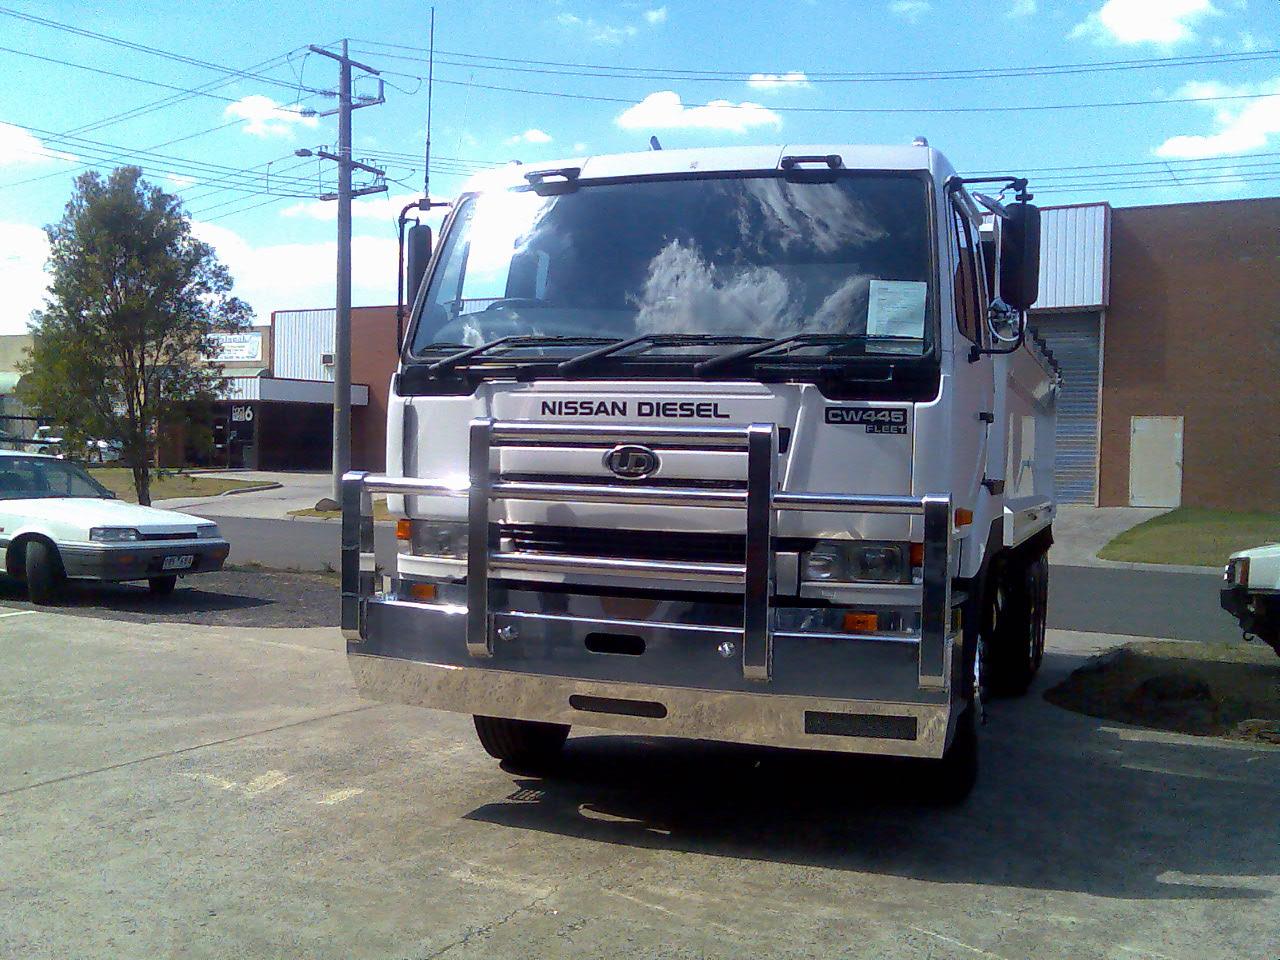 Slider-4-Nissan-Diesel-CW-445-Bullbar